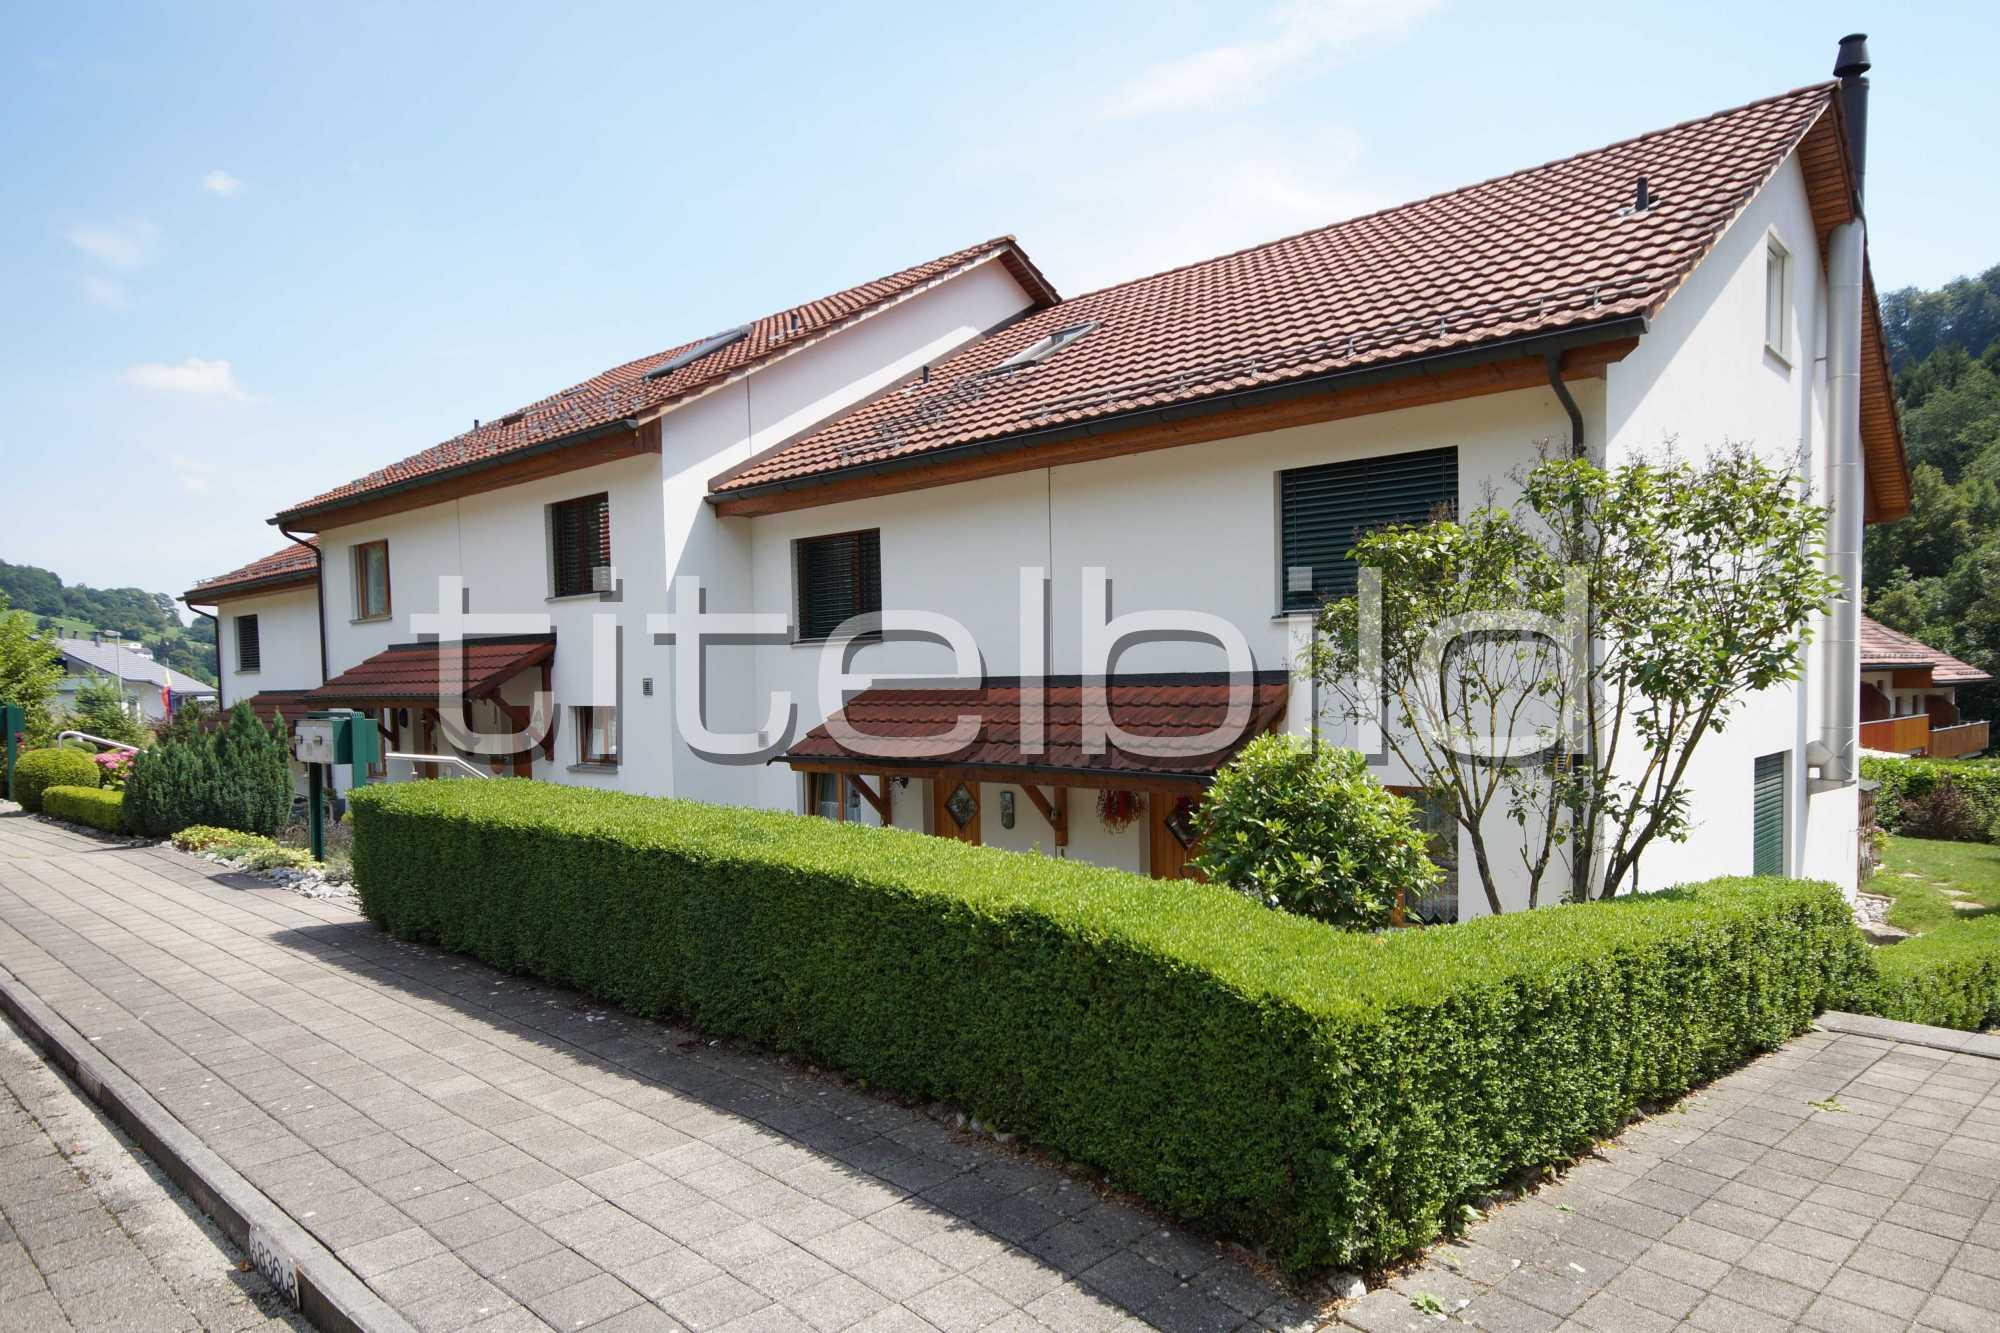 Projektbild-Nr. 2: MFH Chollerweg, Trimbach